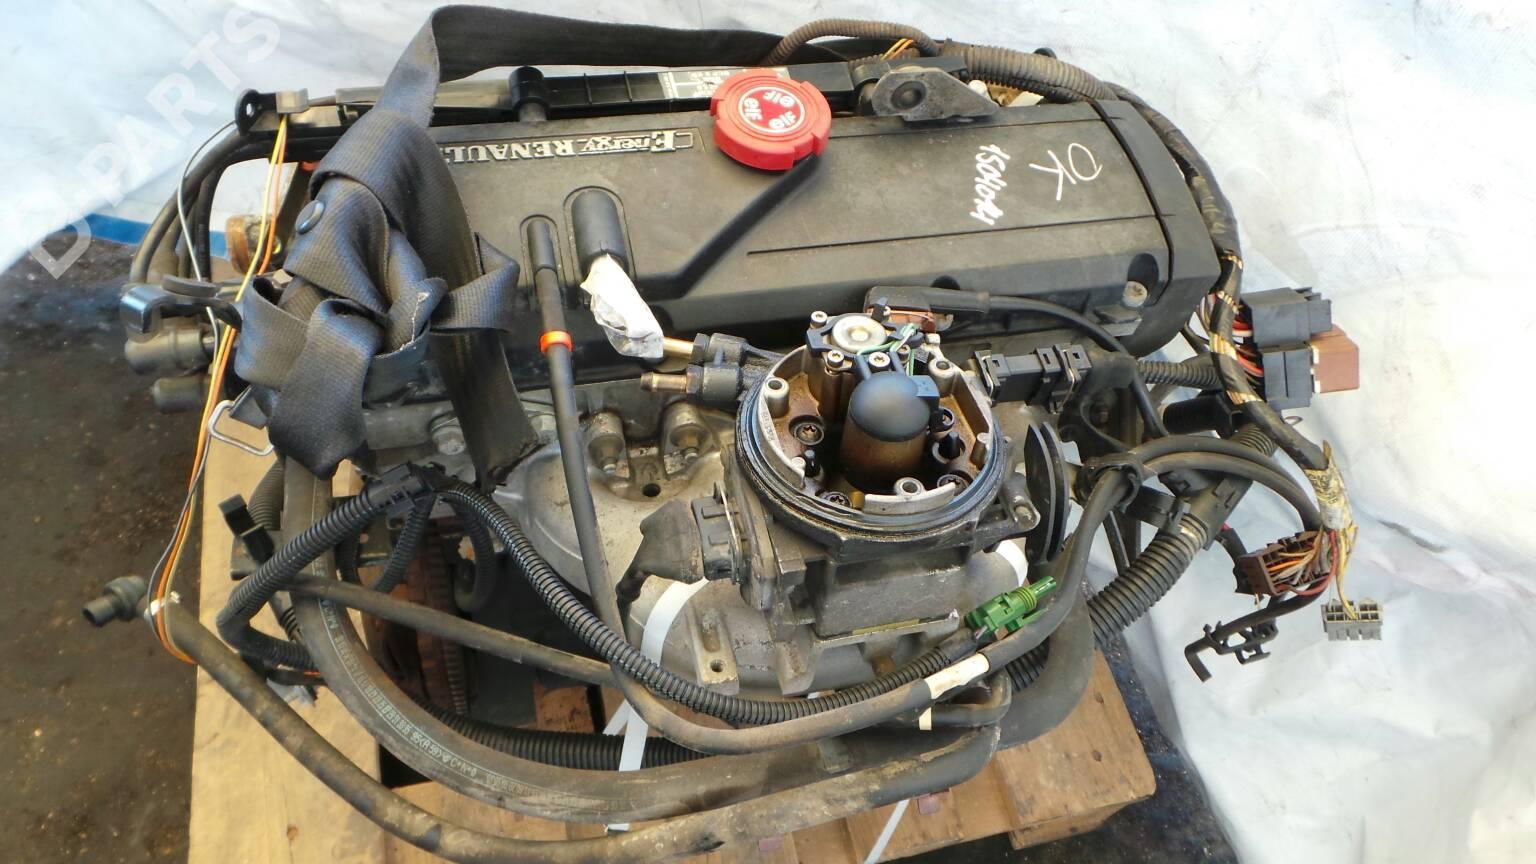 Engine Renault 19 Ii B C53 12 18653 Fuse Box Location Complete C003364 125 Doors